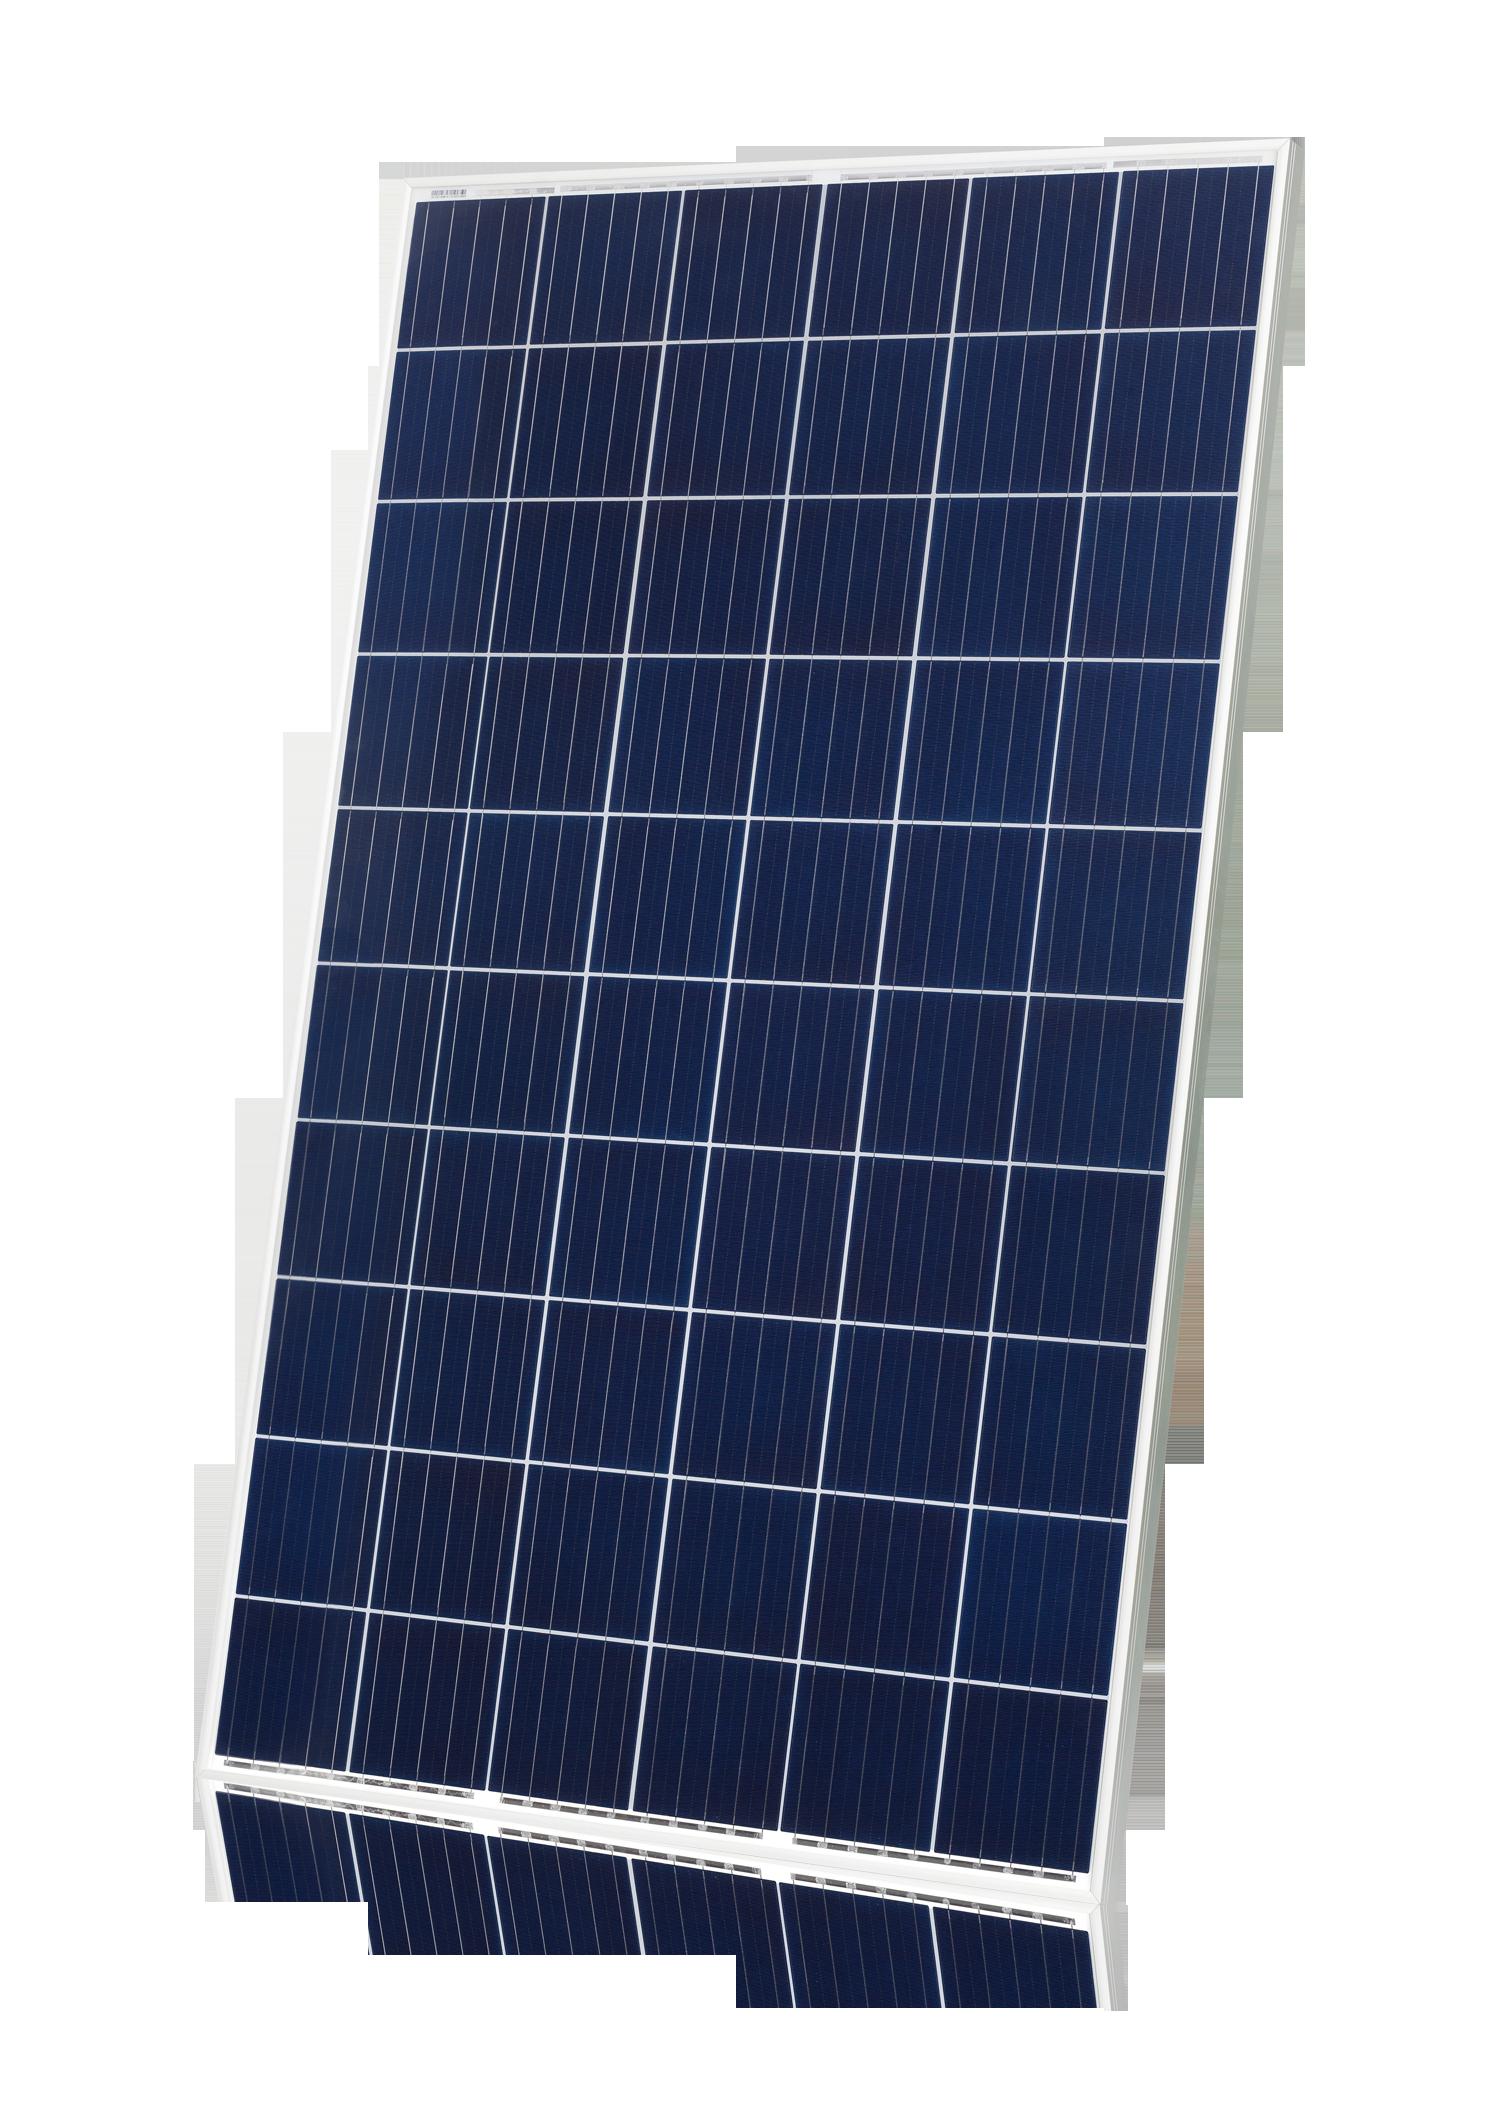 Jinko Solar JKM295M-60B solar panel